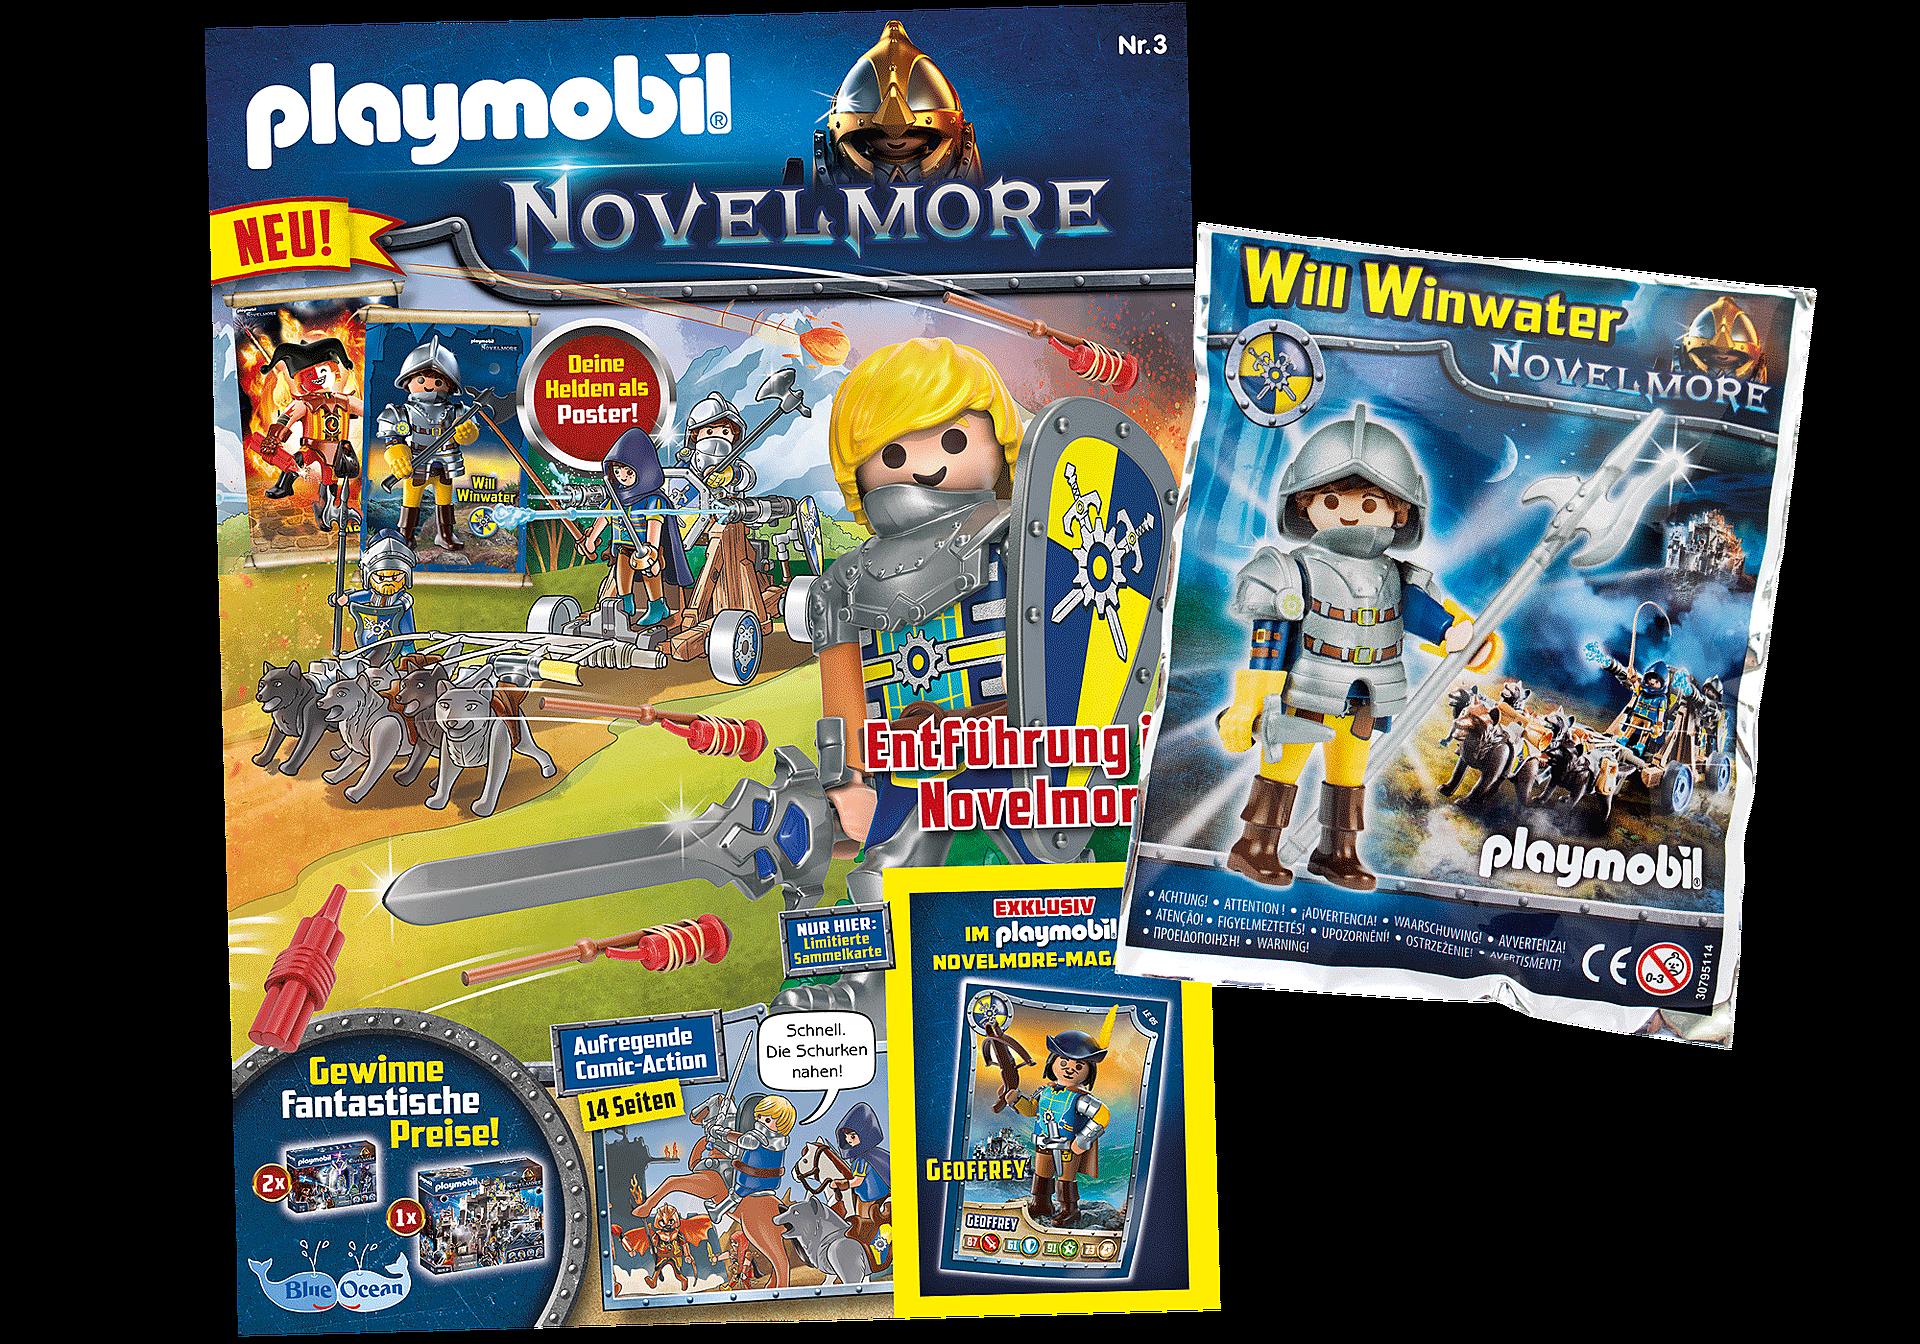 80662 PLAYMOBIL Novelmore-Magazin 3/2020 (Heft 3) zoom image1